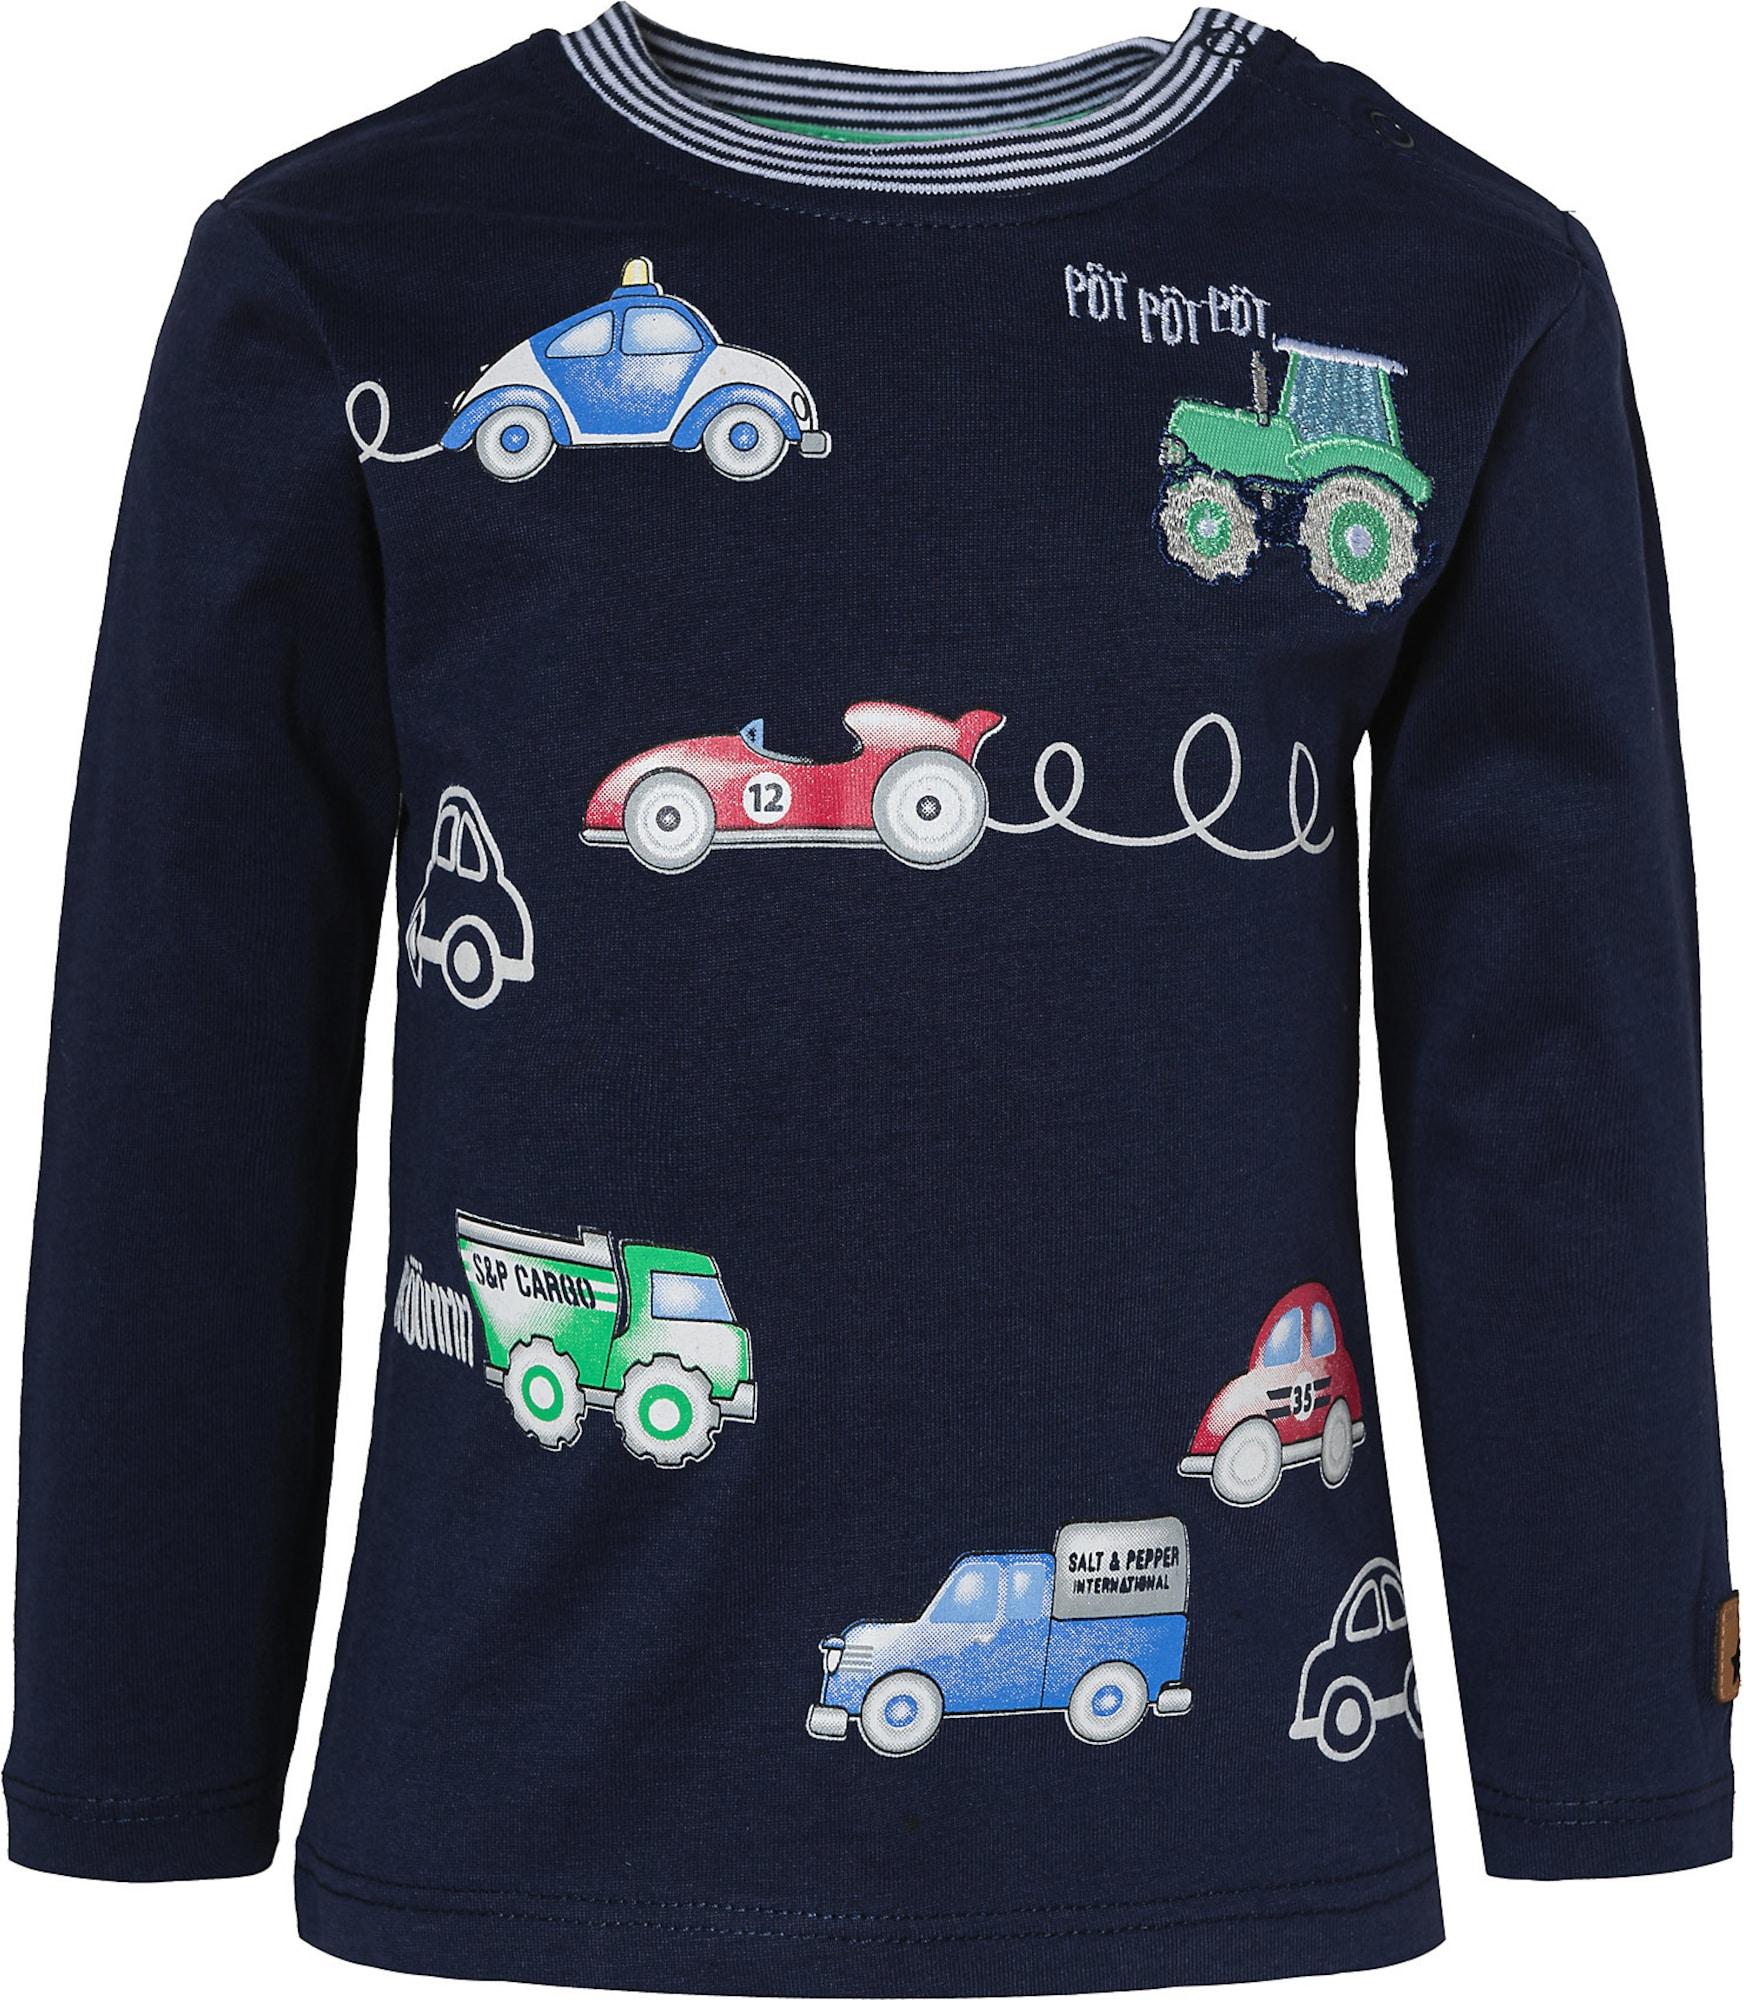 SALT AND PEPPER Marškinėliai mėlyna / žalia / raudona / balta